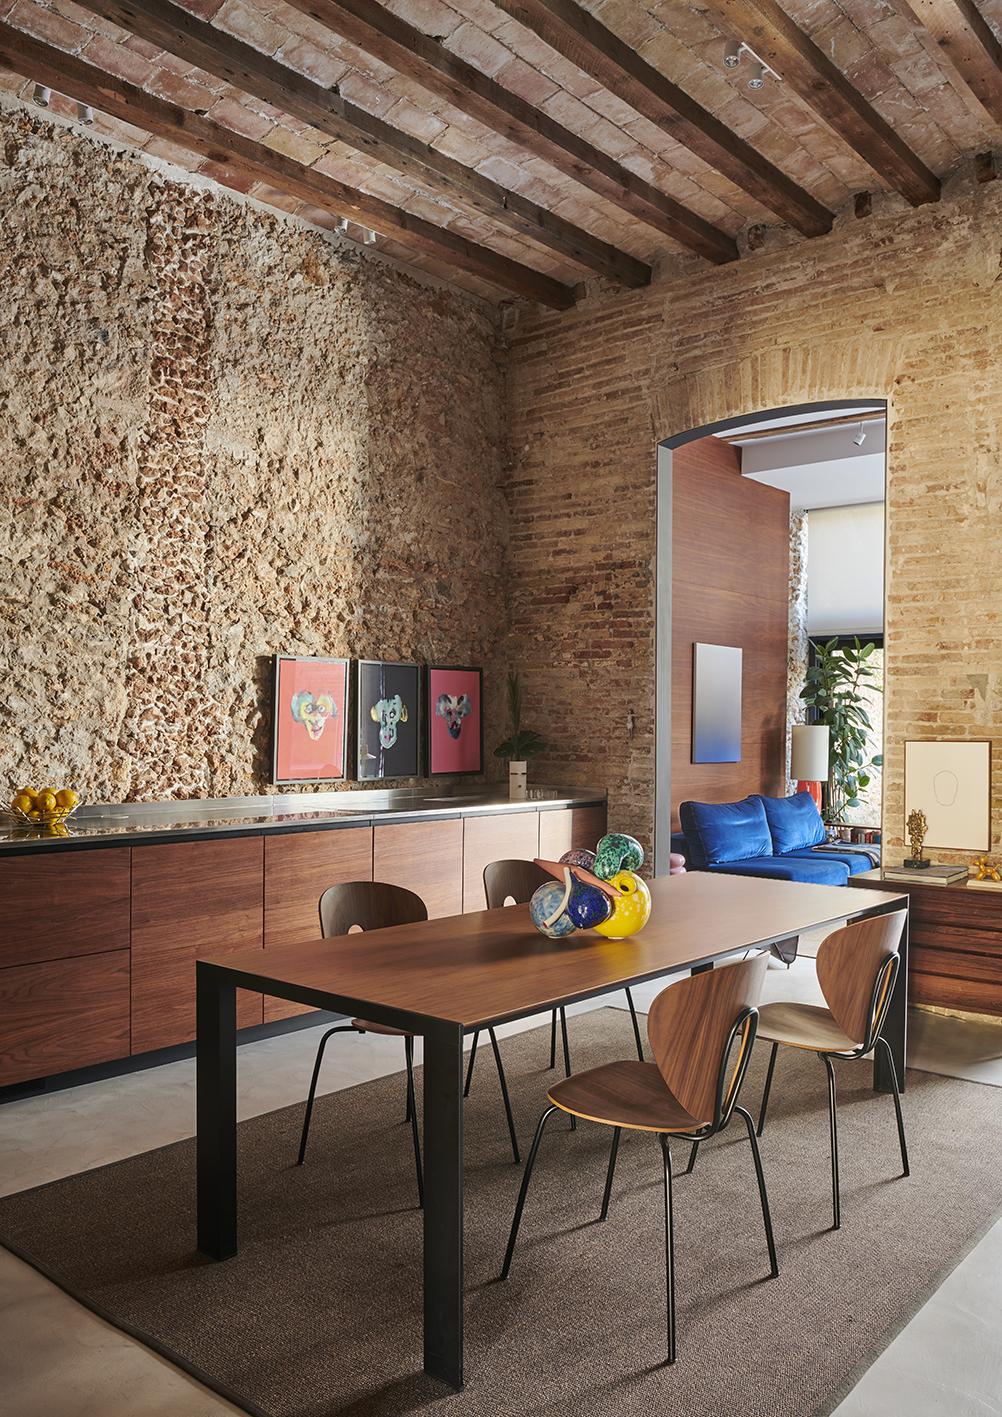 rardo-architects-sitges-barcelona-kitchen-iv